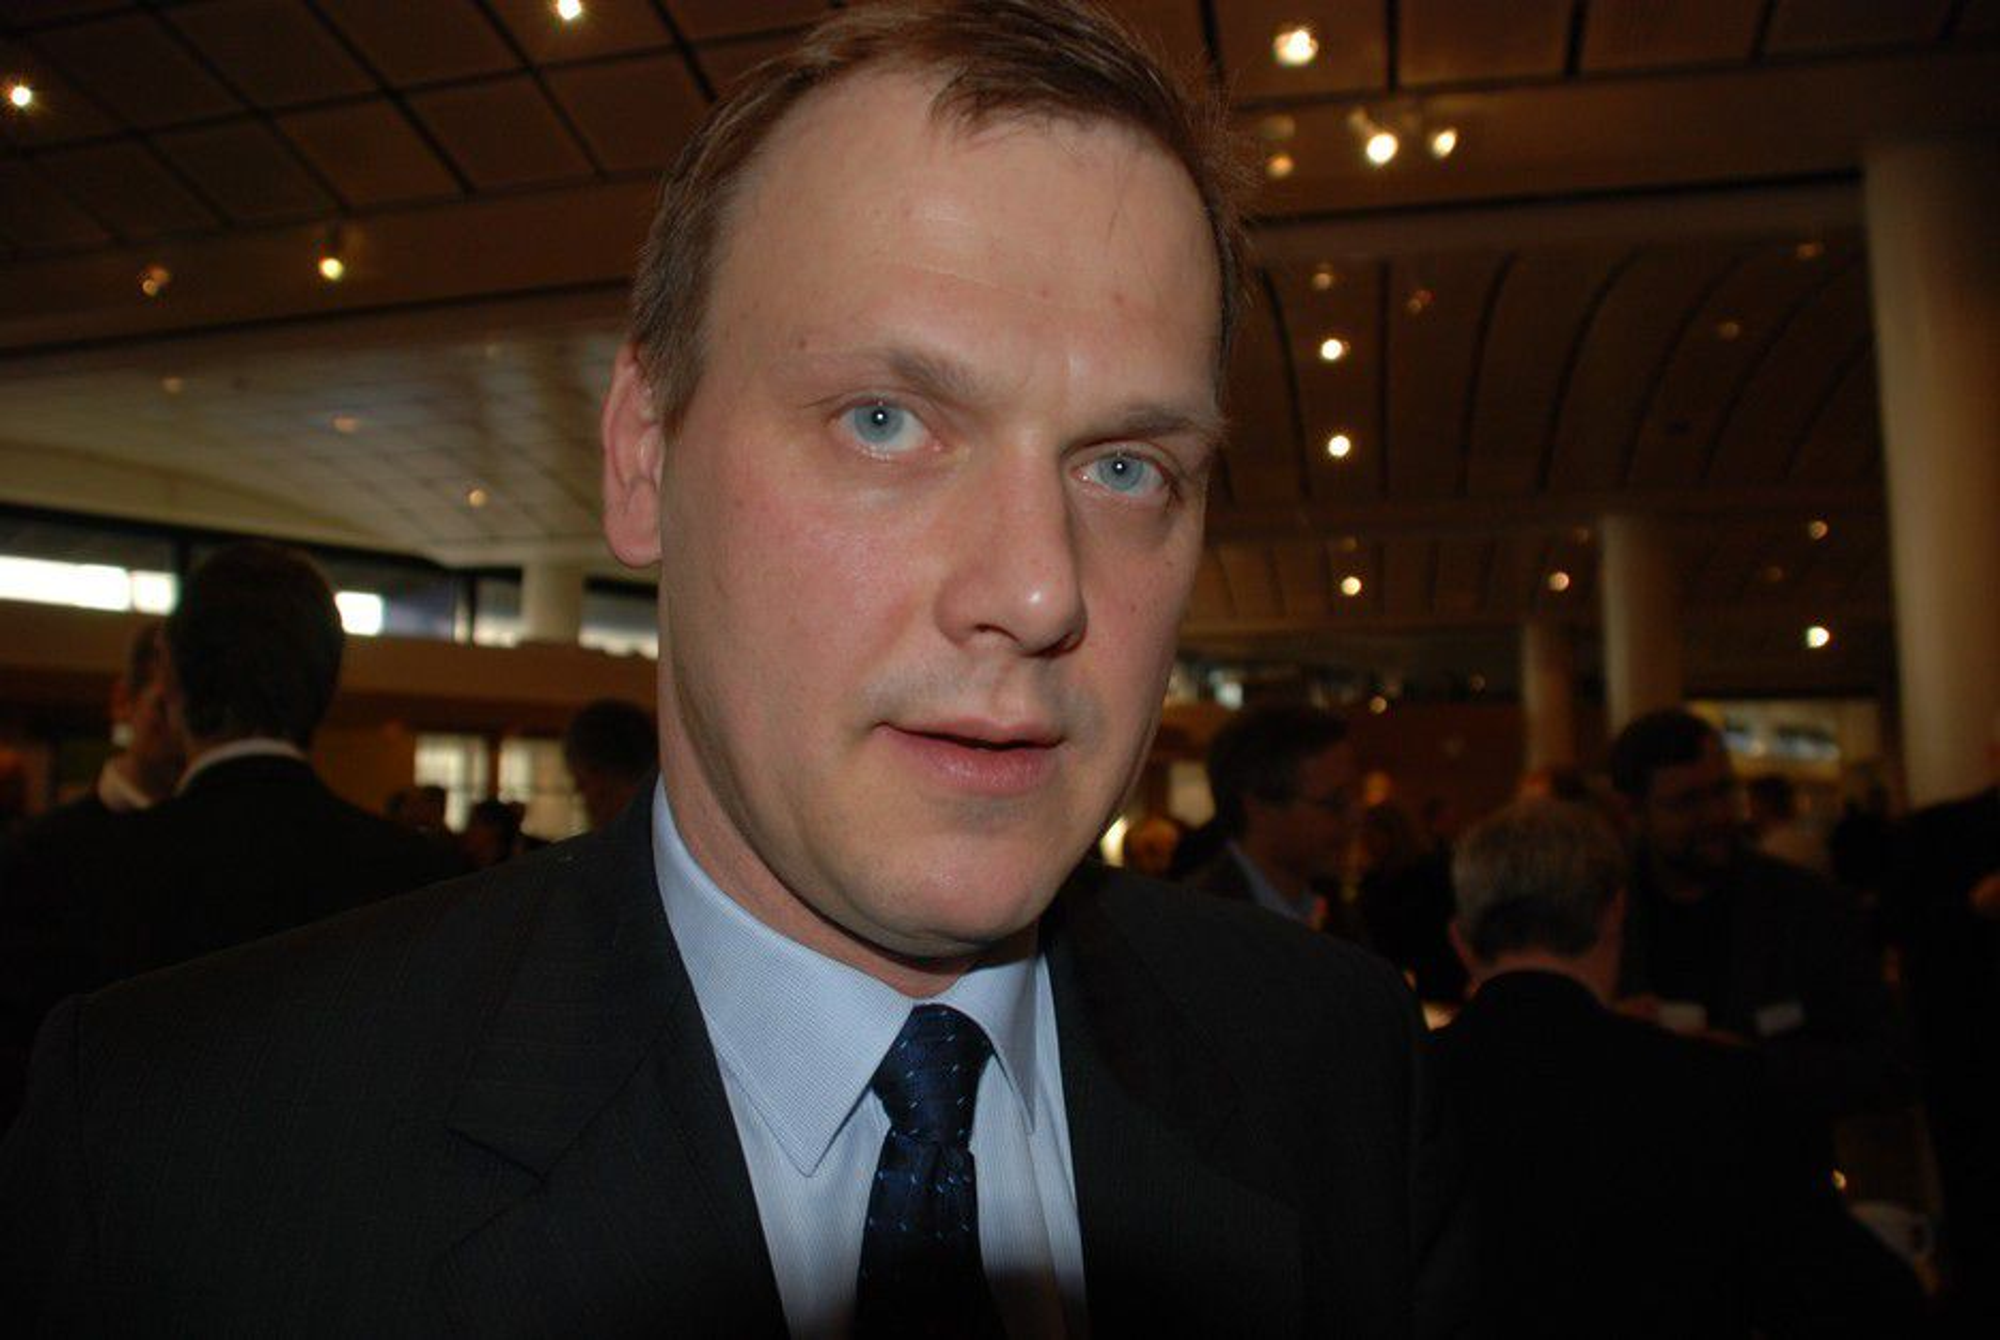 Konstituert sjef for Enova, Fridtjof Unander.